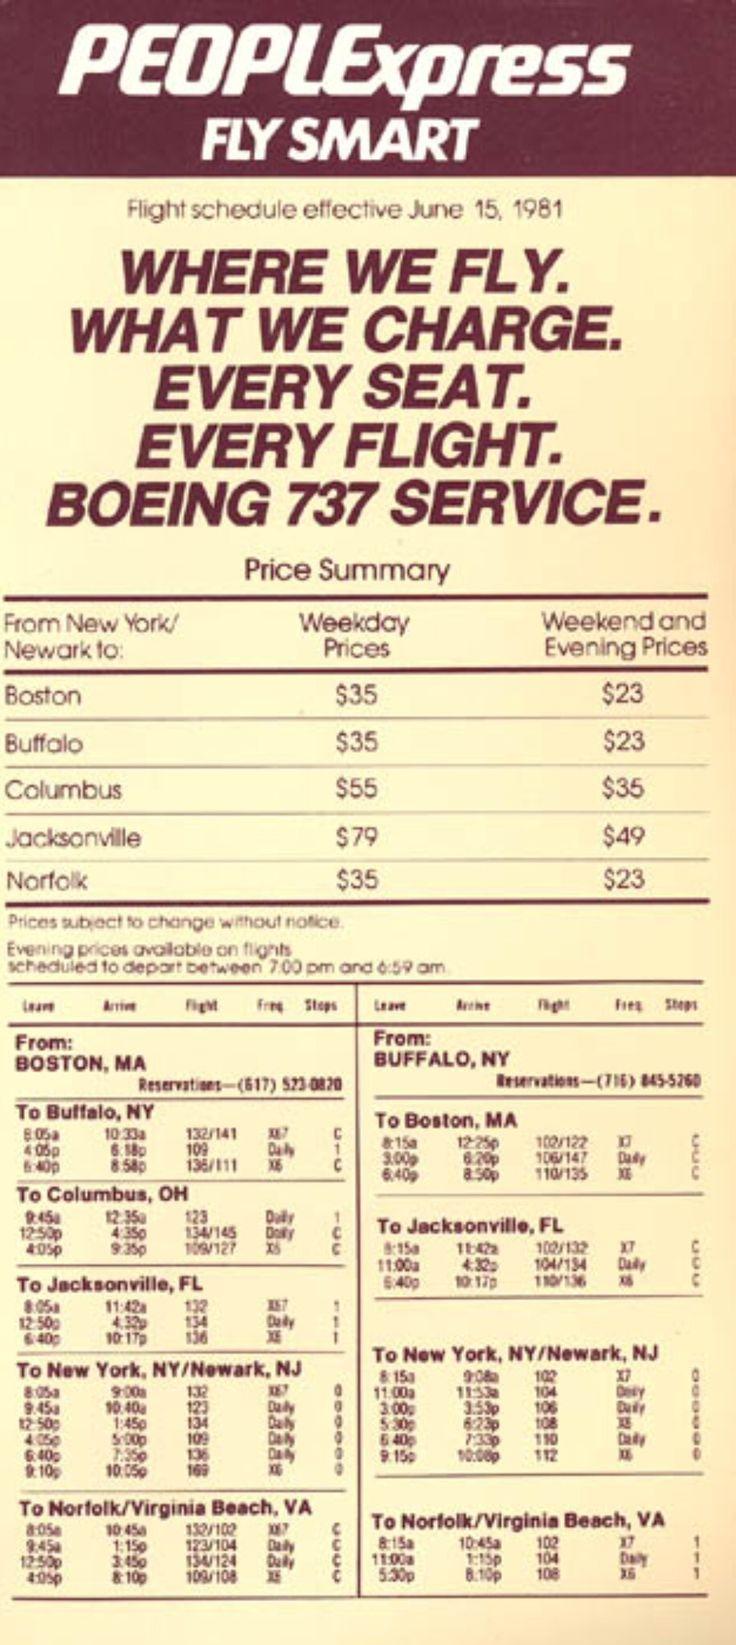 PeoplExpress airfare prices, June 15, 1981